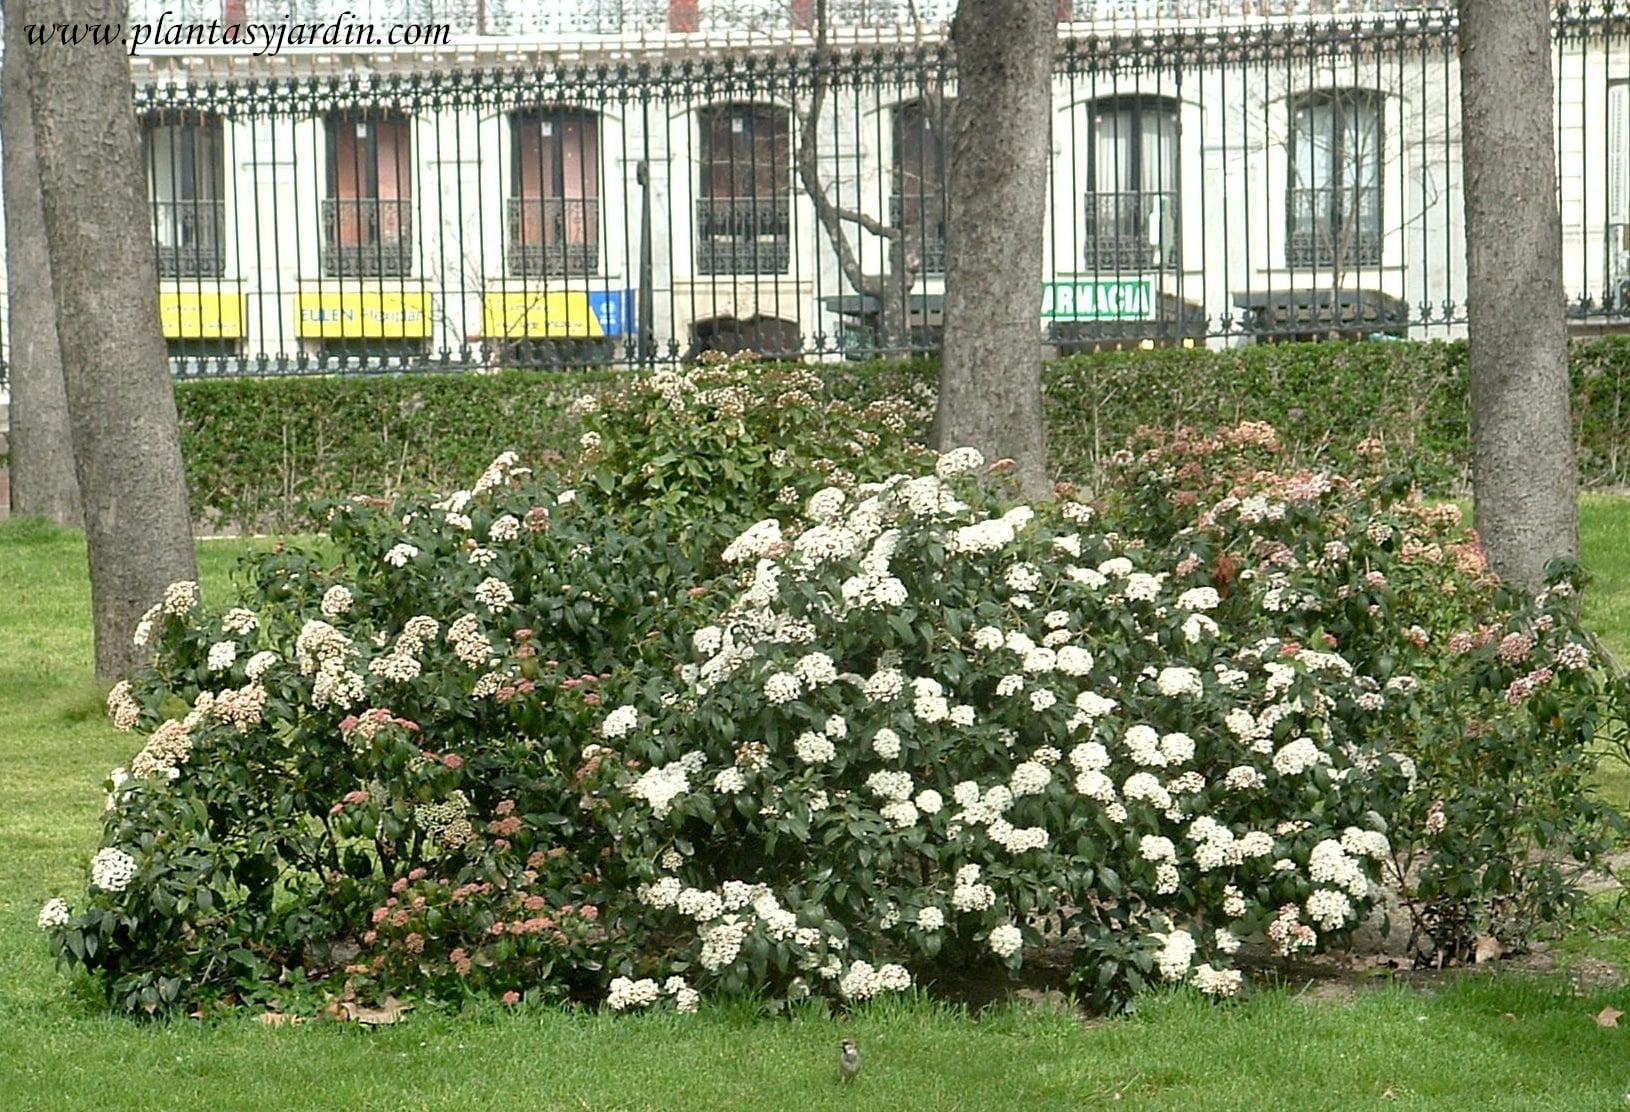 Viburnun tinus en el Parque del Buen Retiro en Madrid